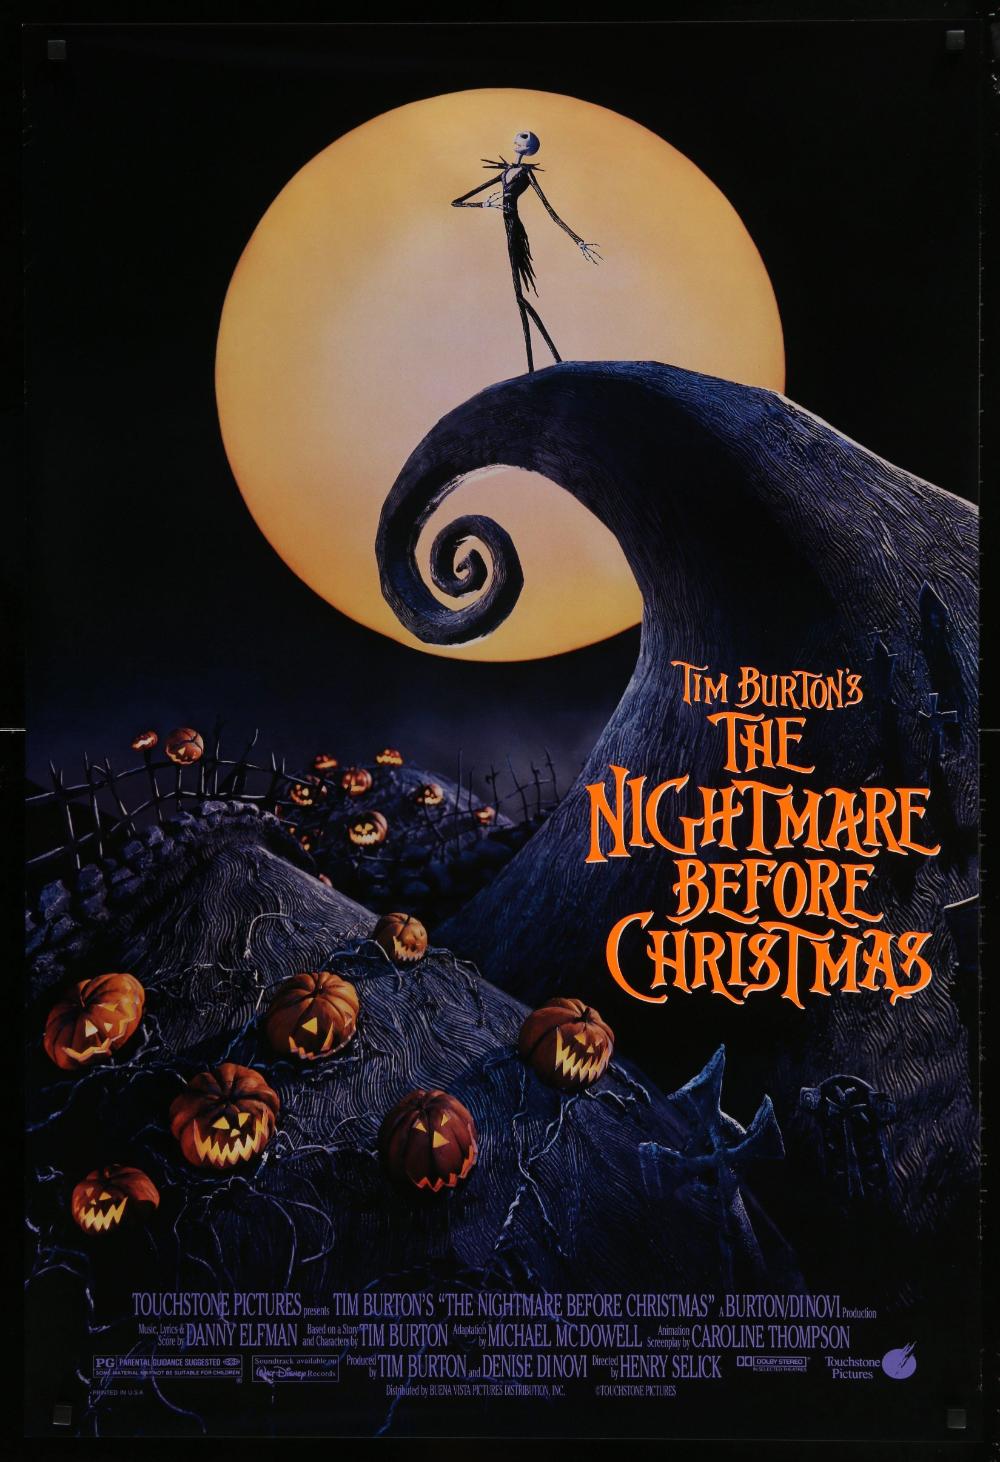 The Nightmare Before Christmas in 2020 Nightmare before